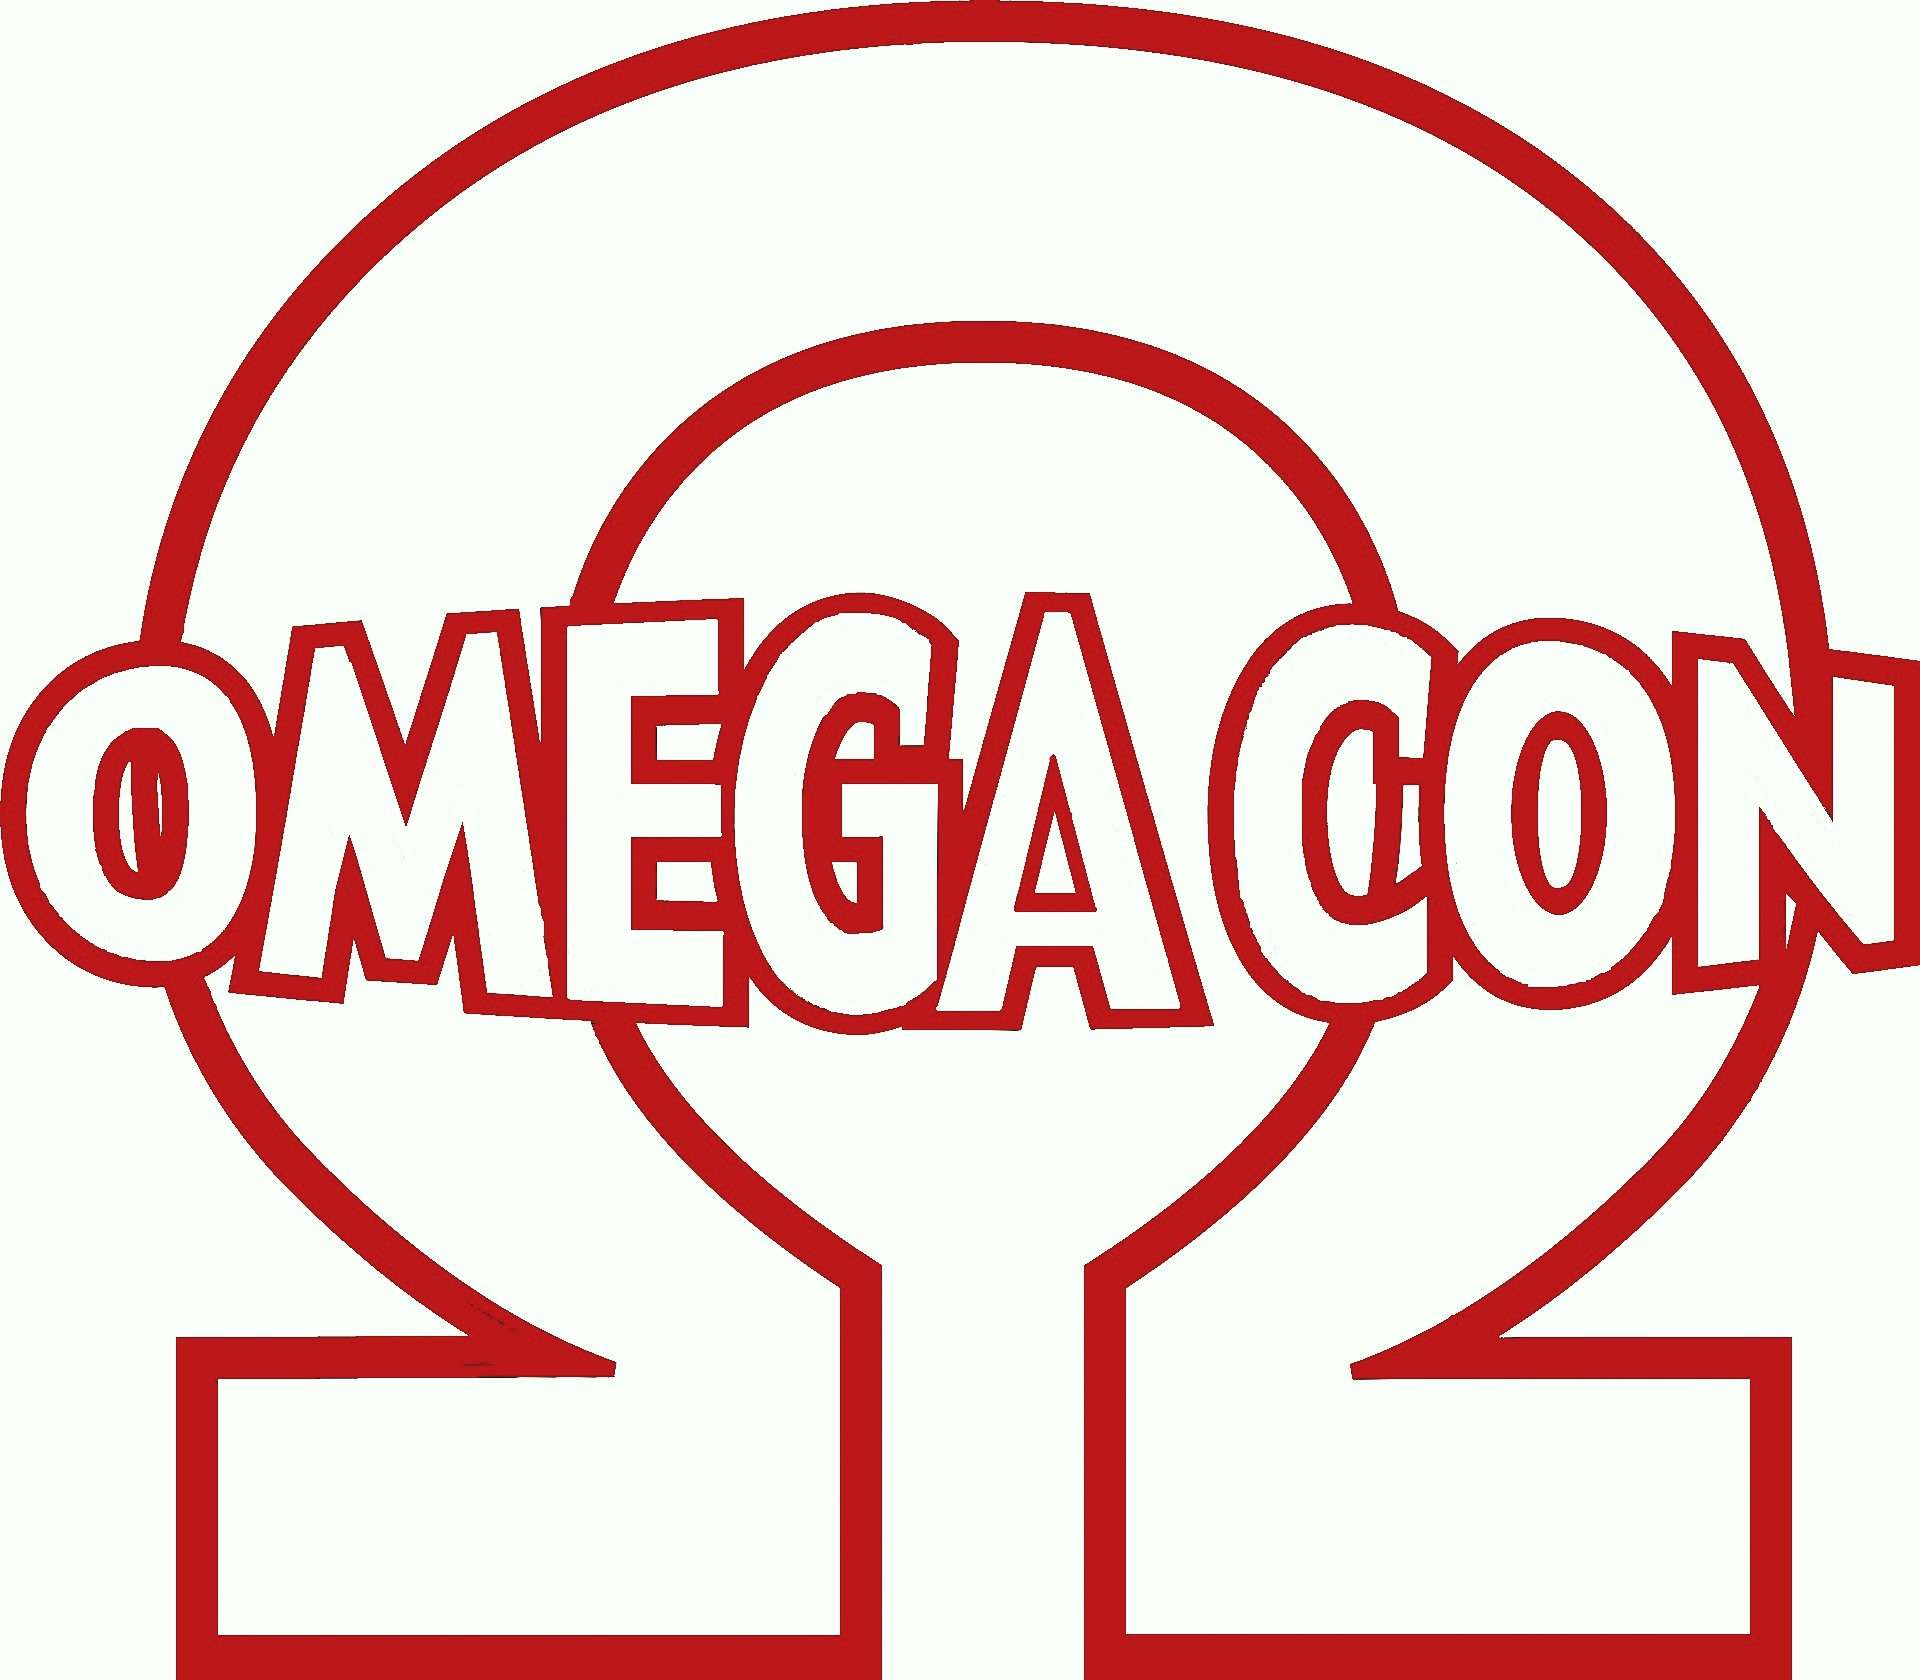 Omega Con